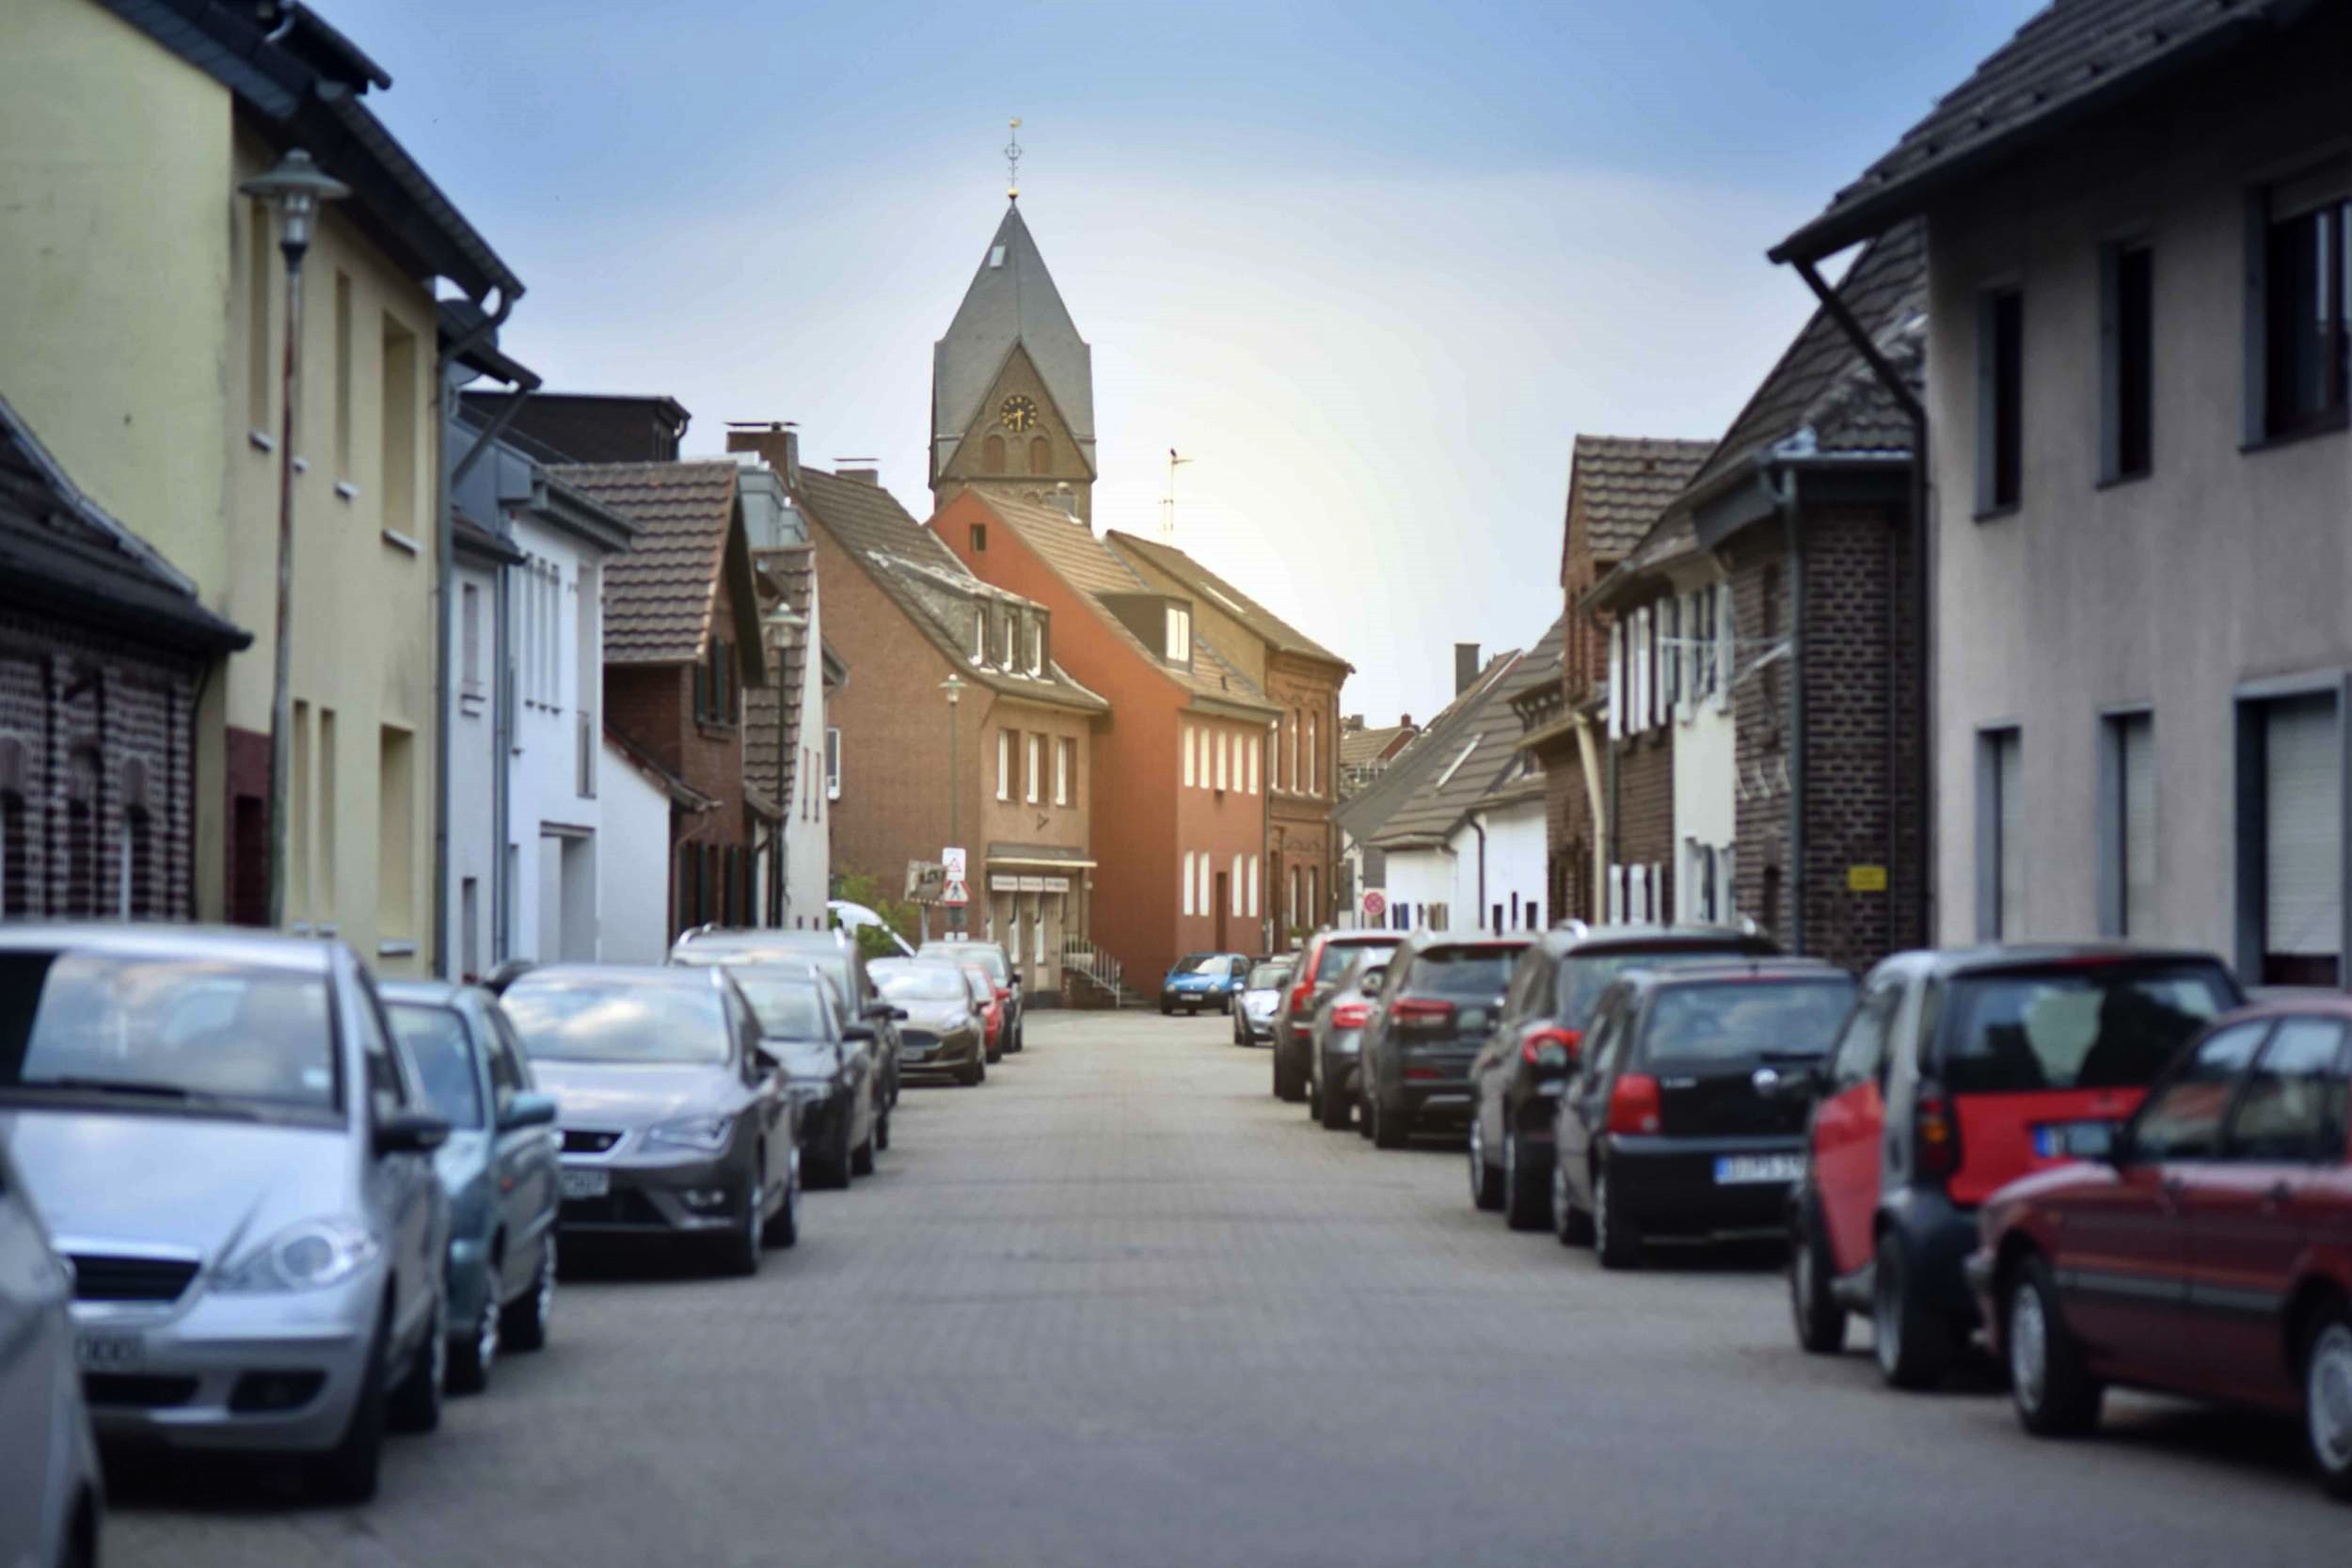 Village near Düsseldorf, Germany, pink trench, Ralph Lauren white tee, star scarf, Prada tote, Gucci sunglasses. Photo: Nicola Nolting, Image©sourcingstyle.com